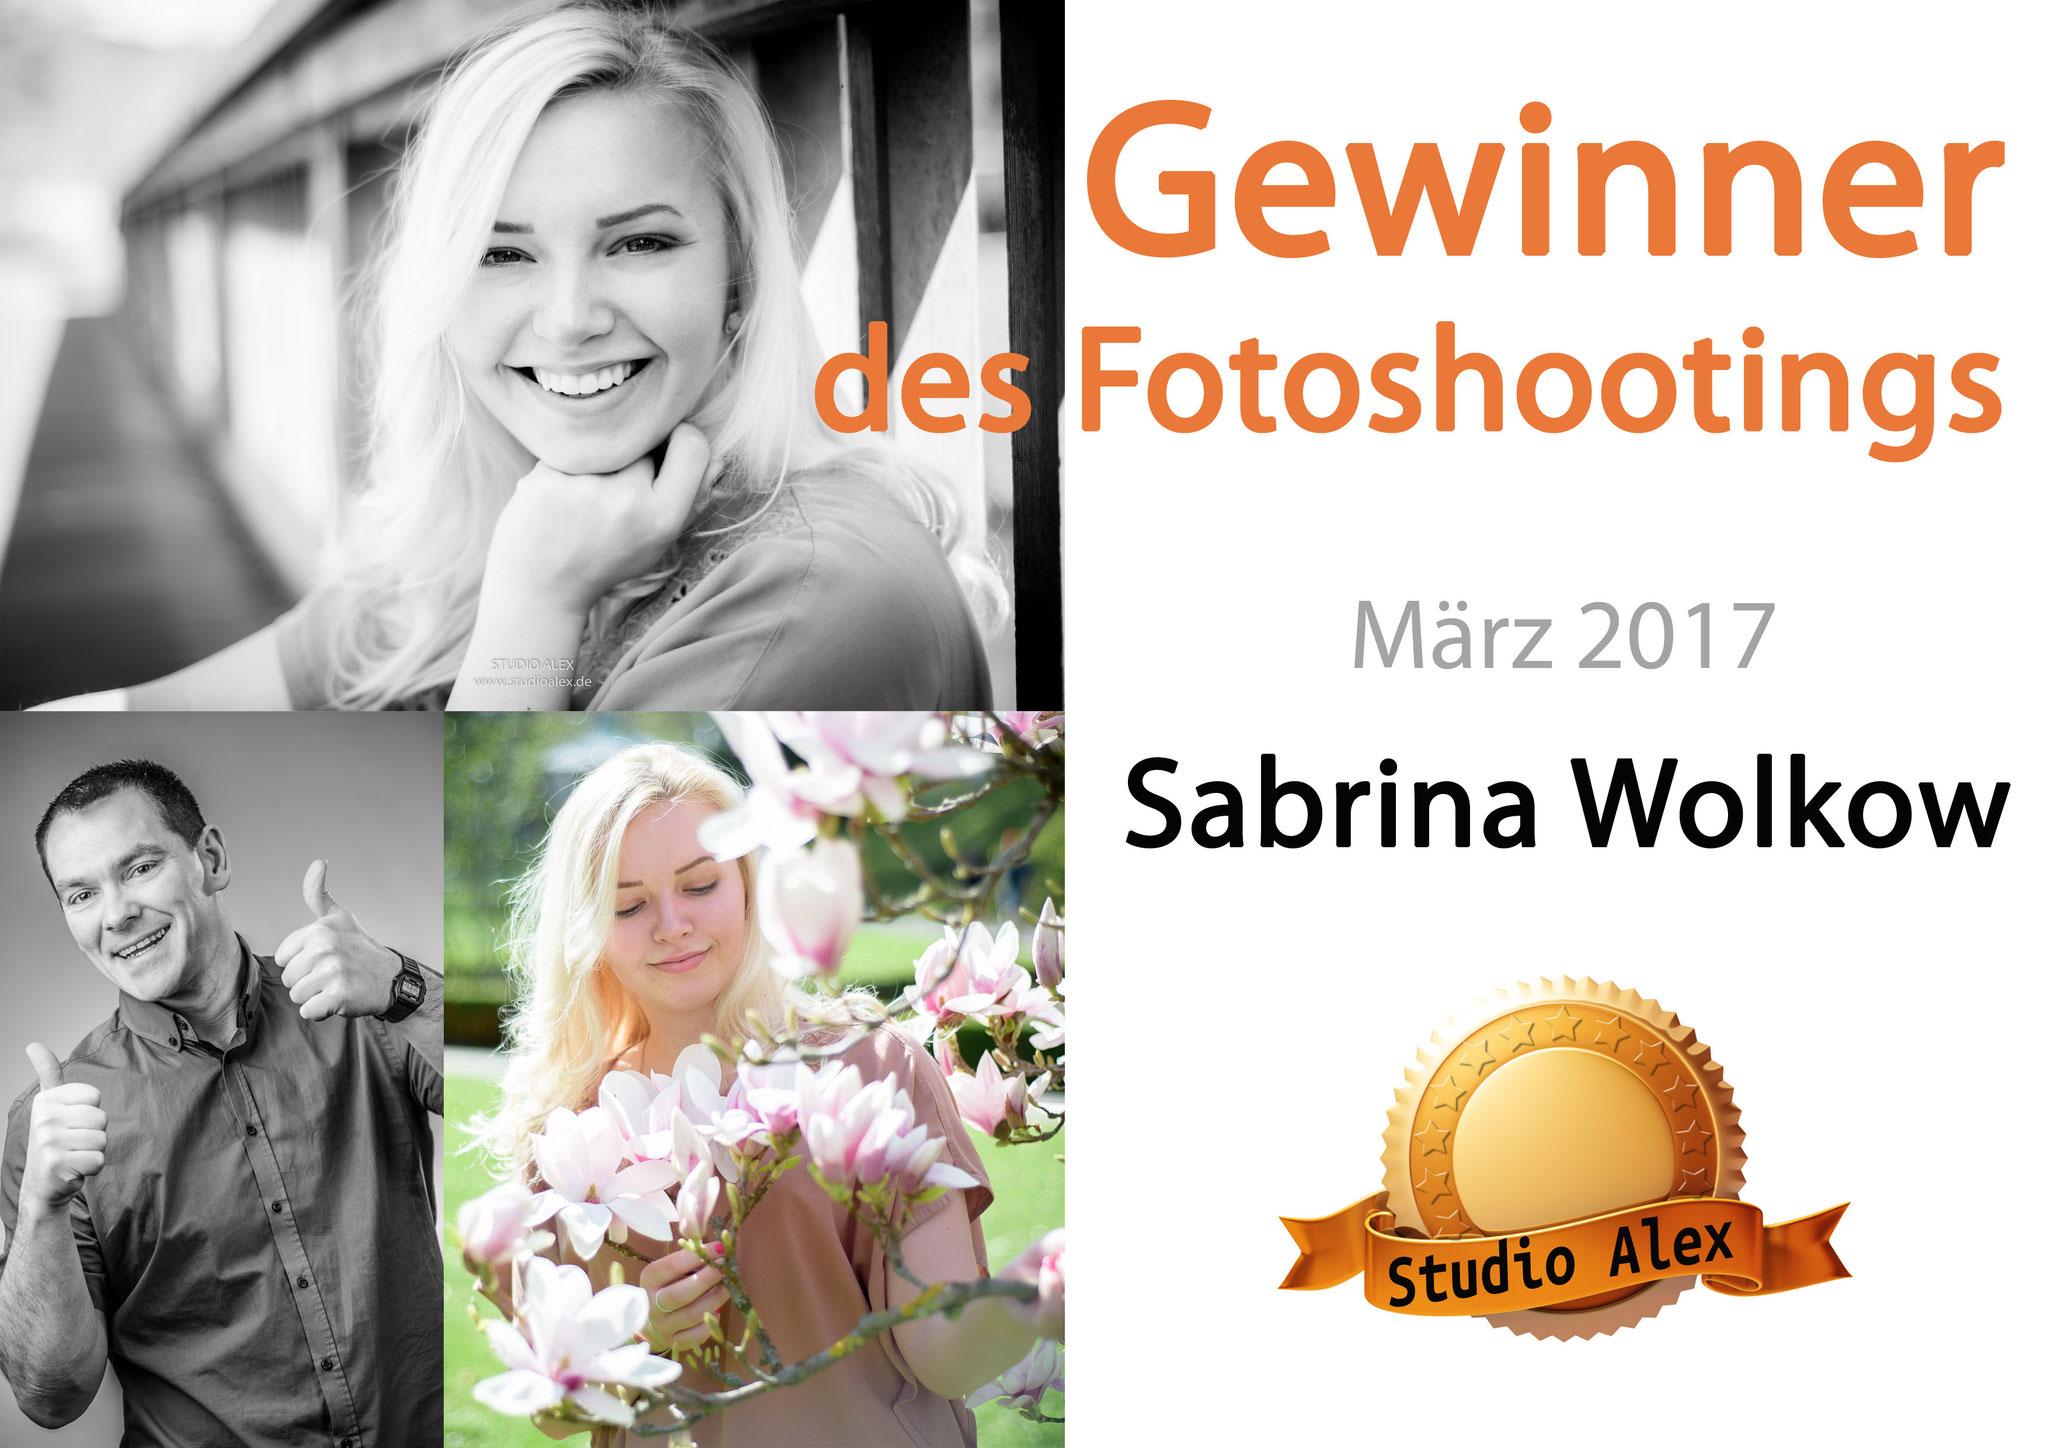 Gewinnspiel Fotoshootingbei Studio Alex in Amberg Oberpfalz